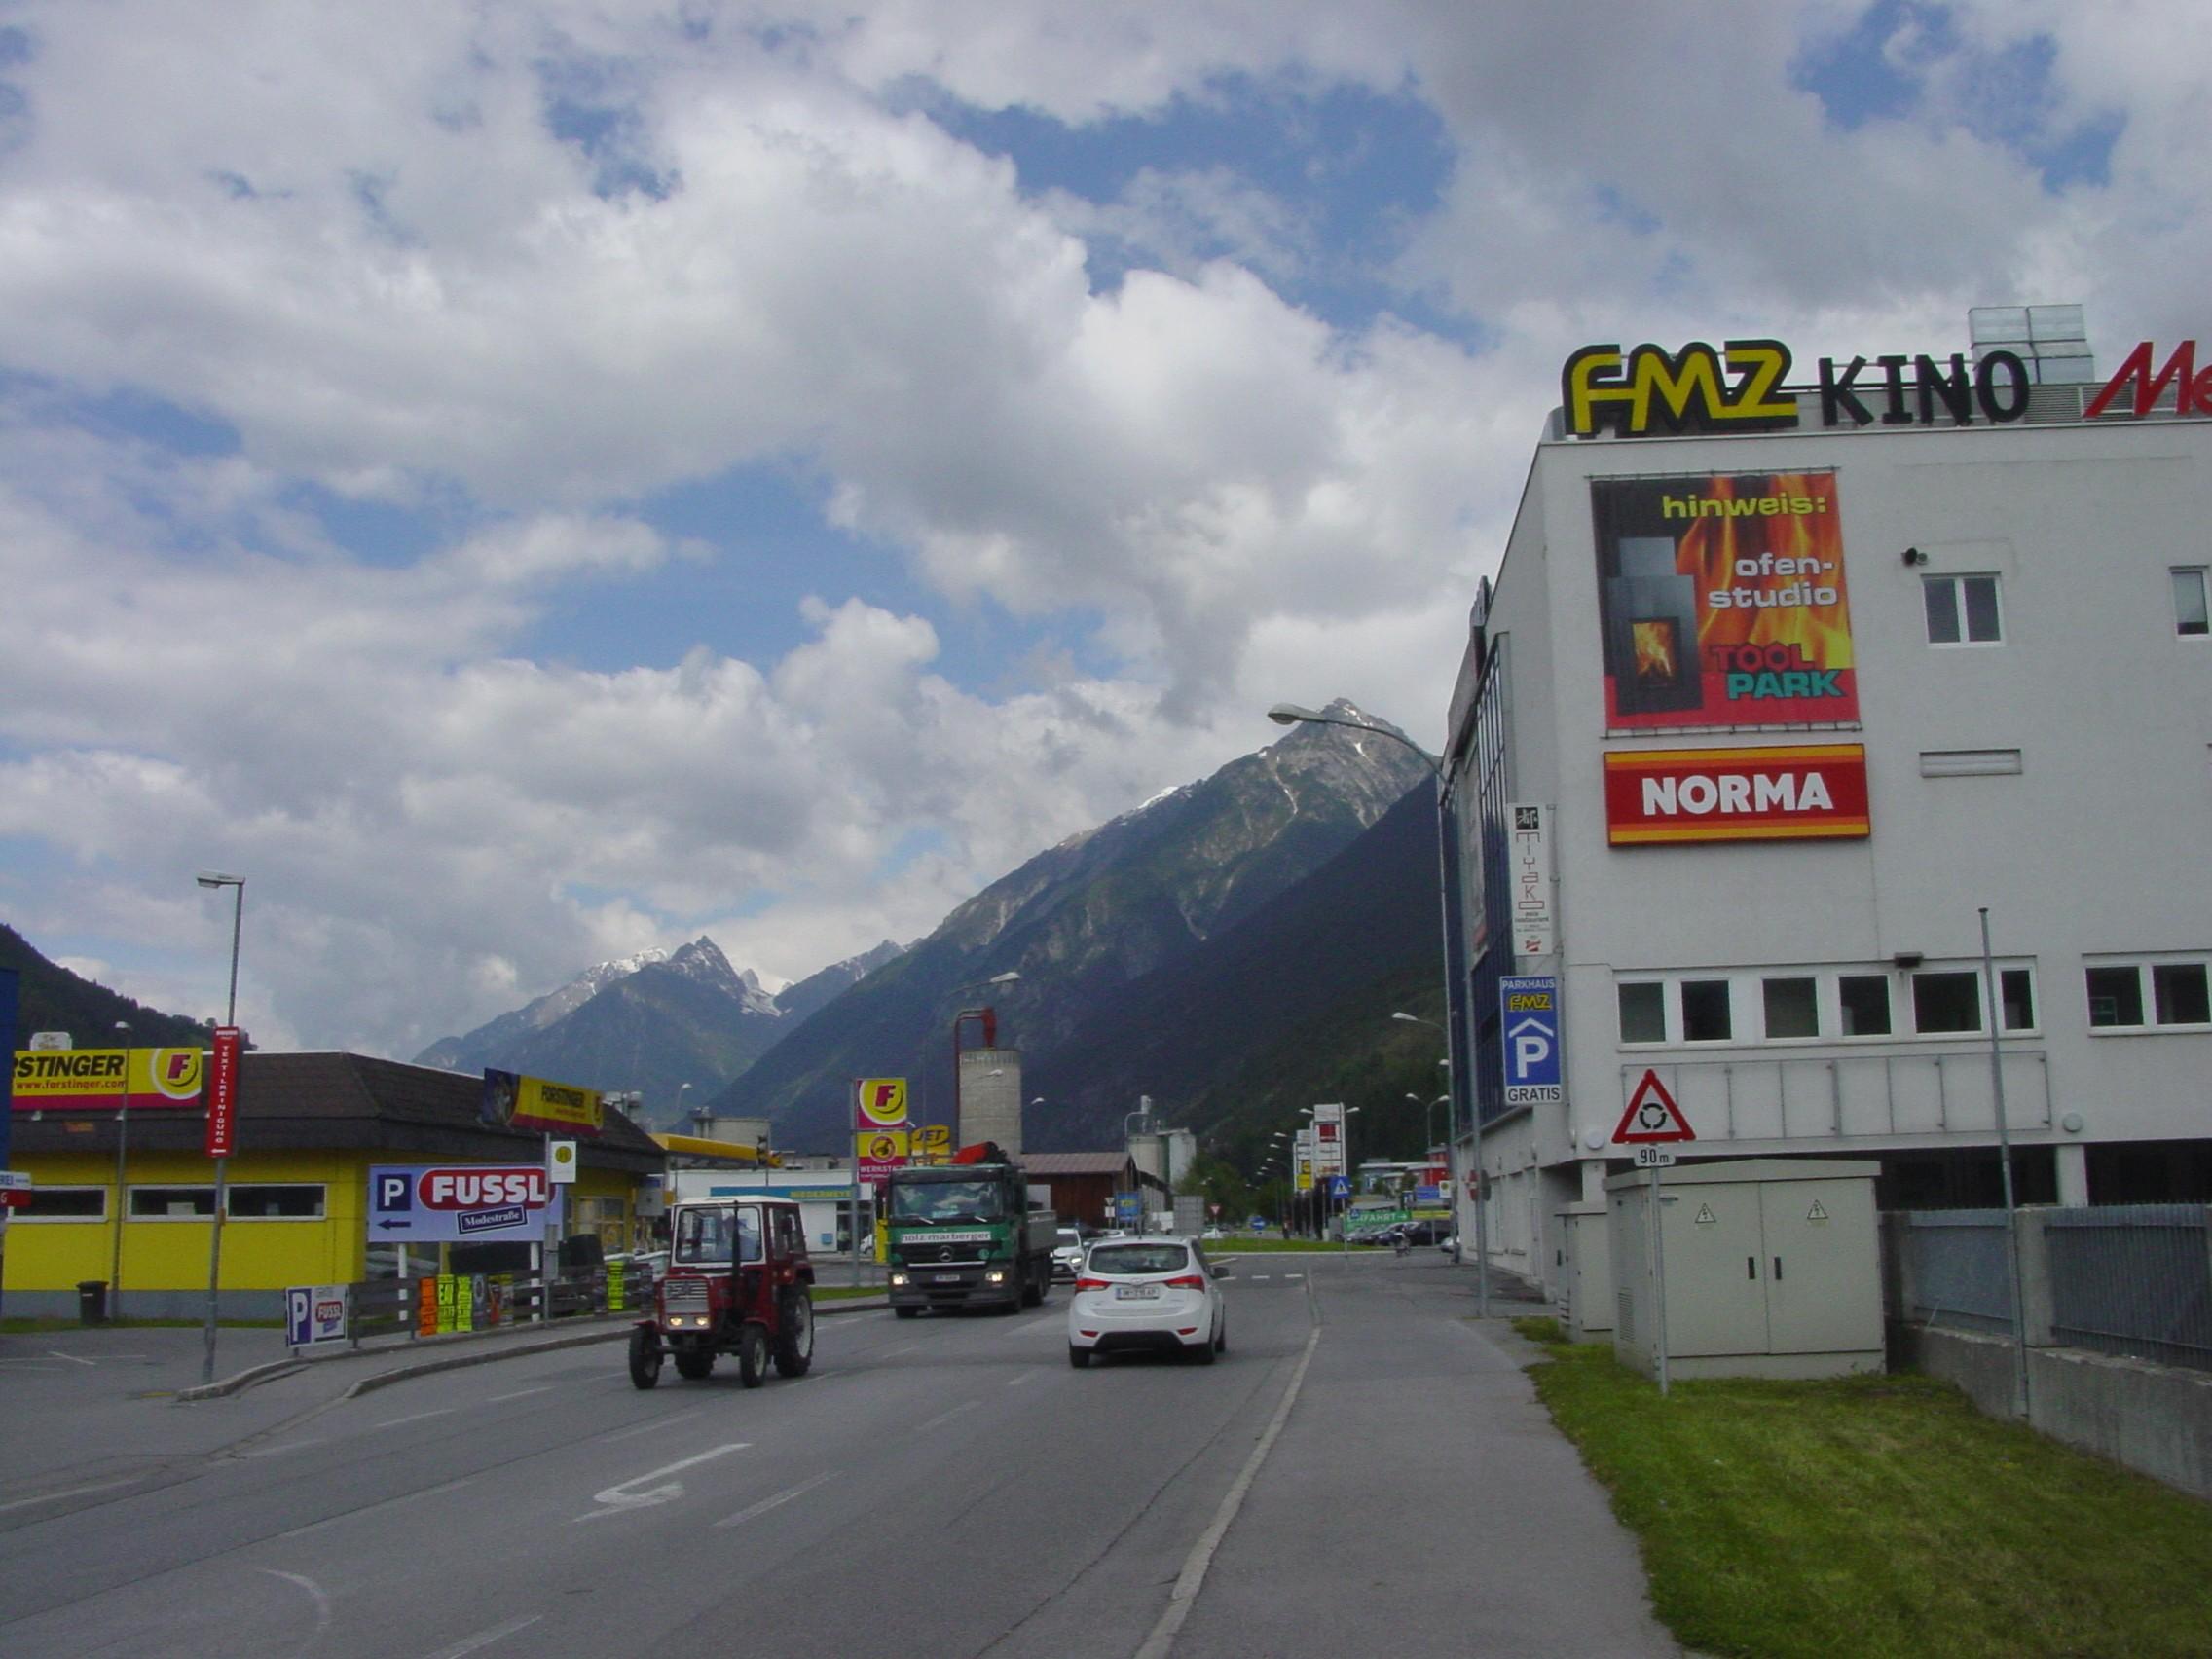 Fmz Kino